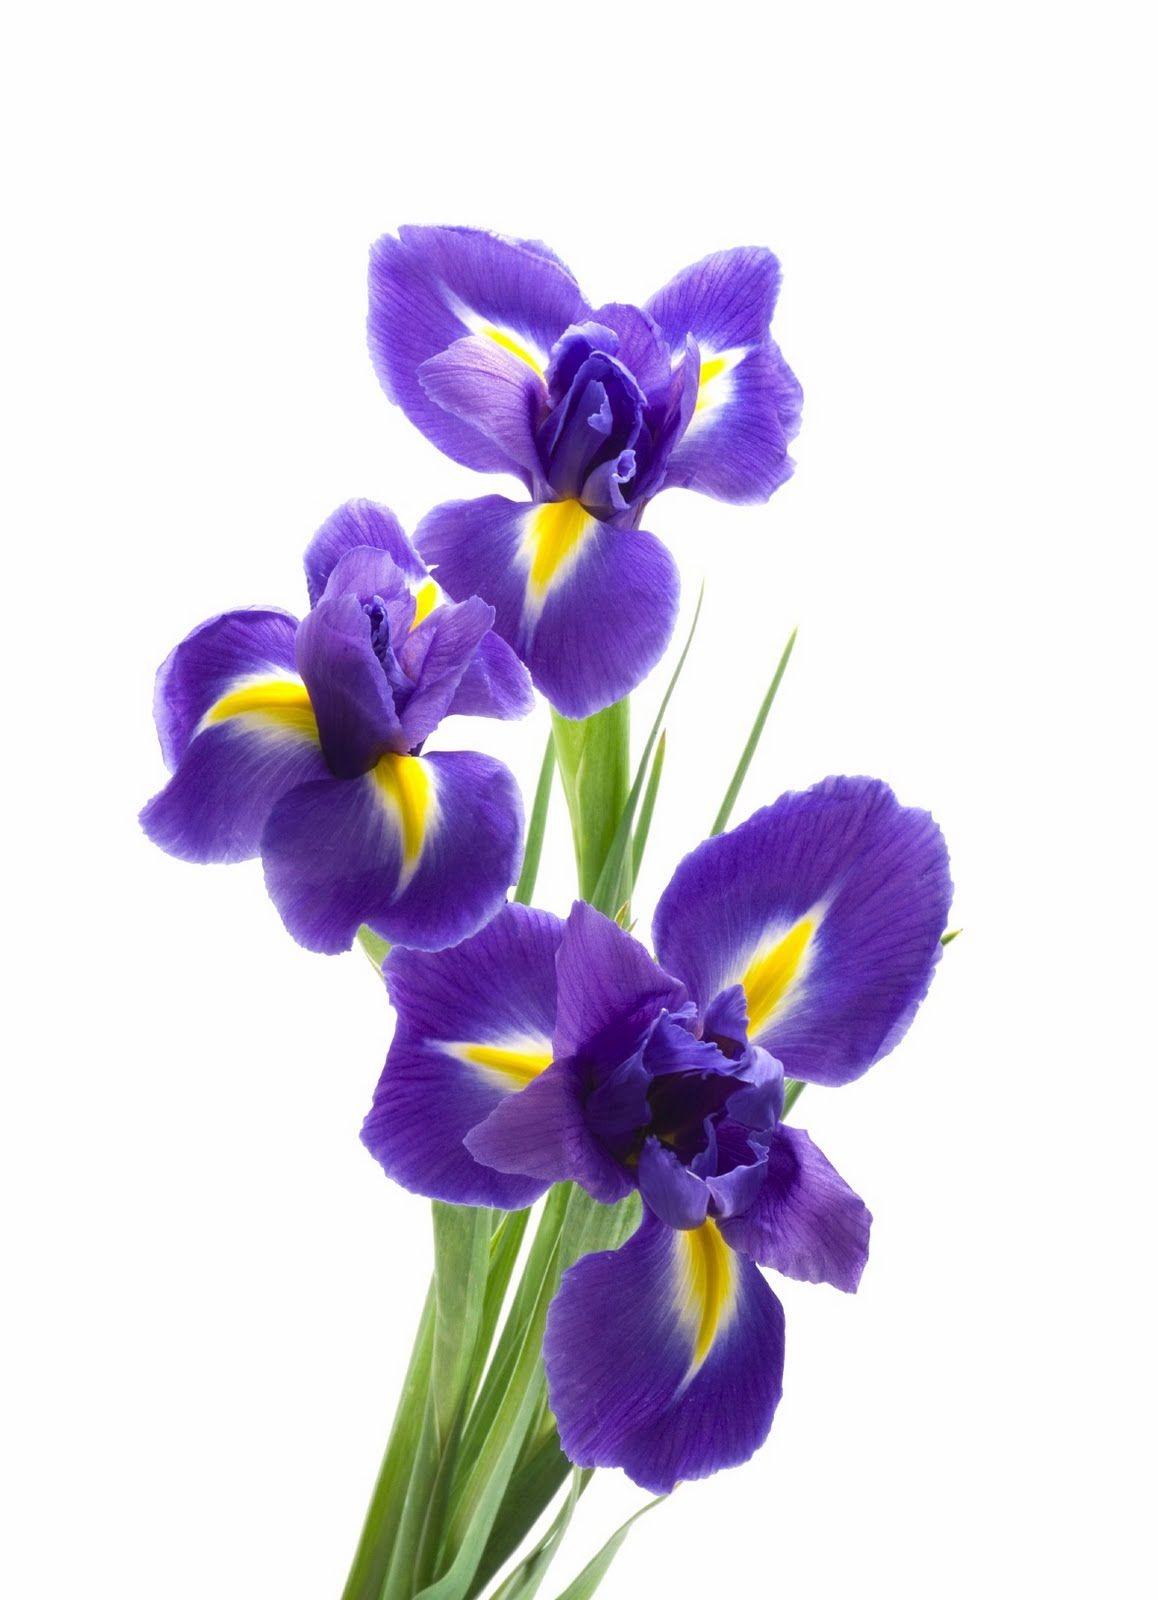 Iris Bring Home This Months Fresh Ten Special 10 Iris For 10